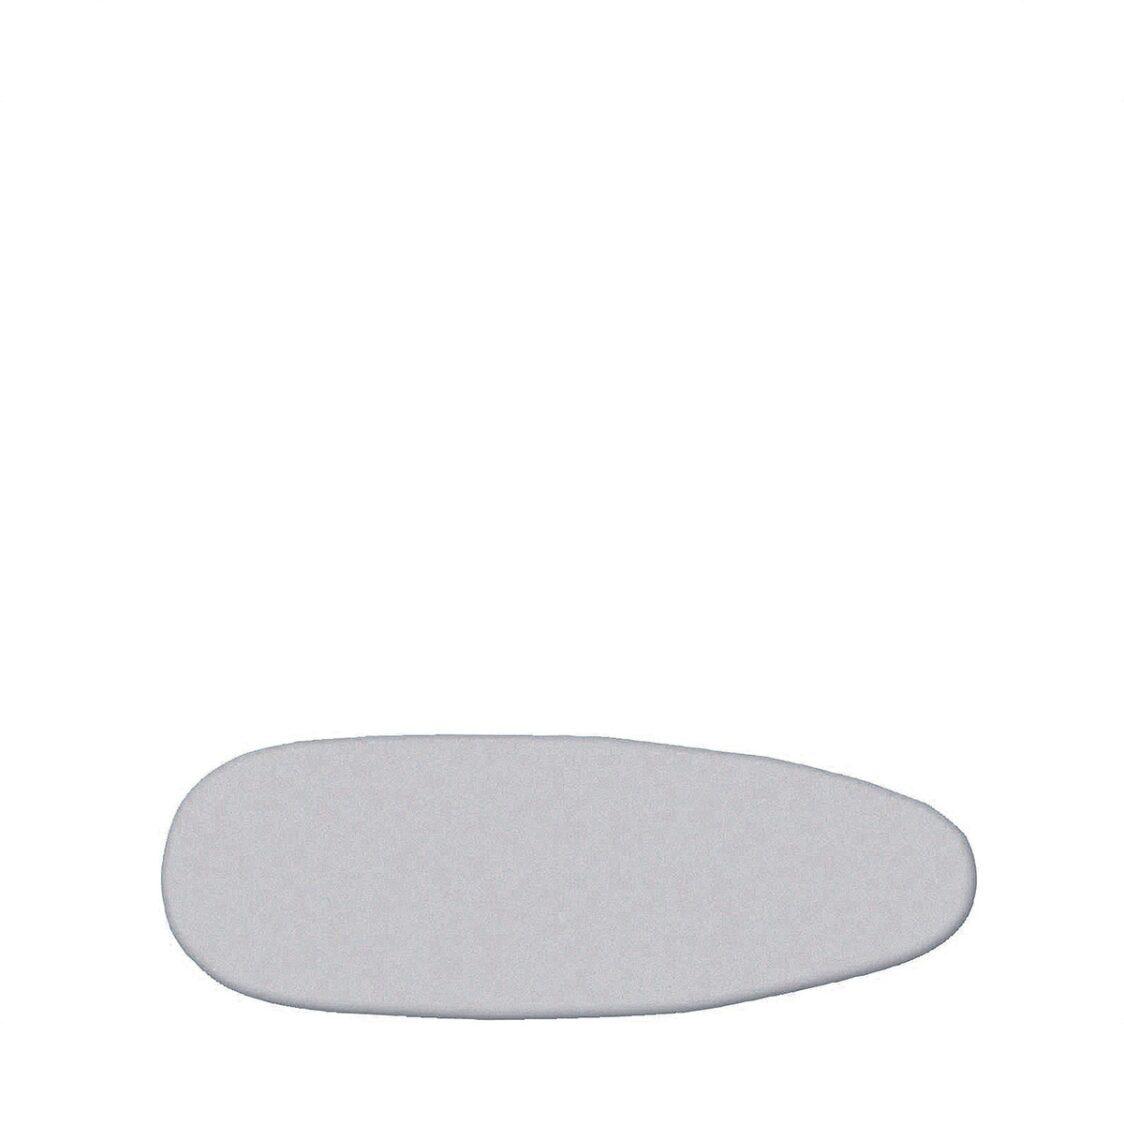 Rayen Ironing Board Cover Al 115X38 cm R615100